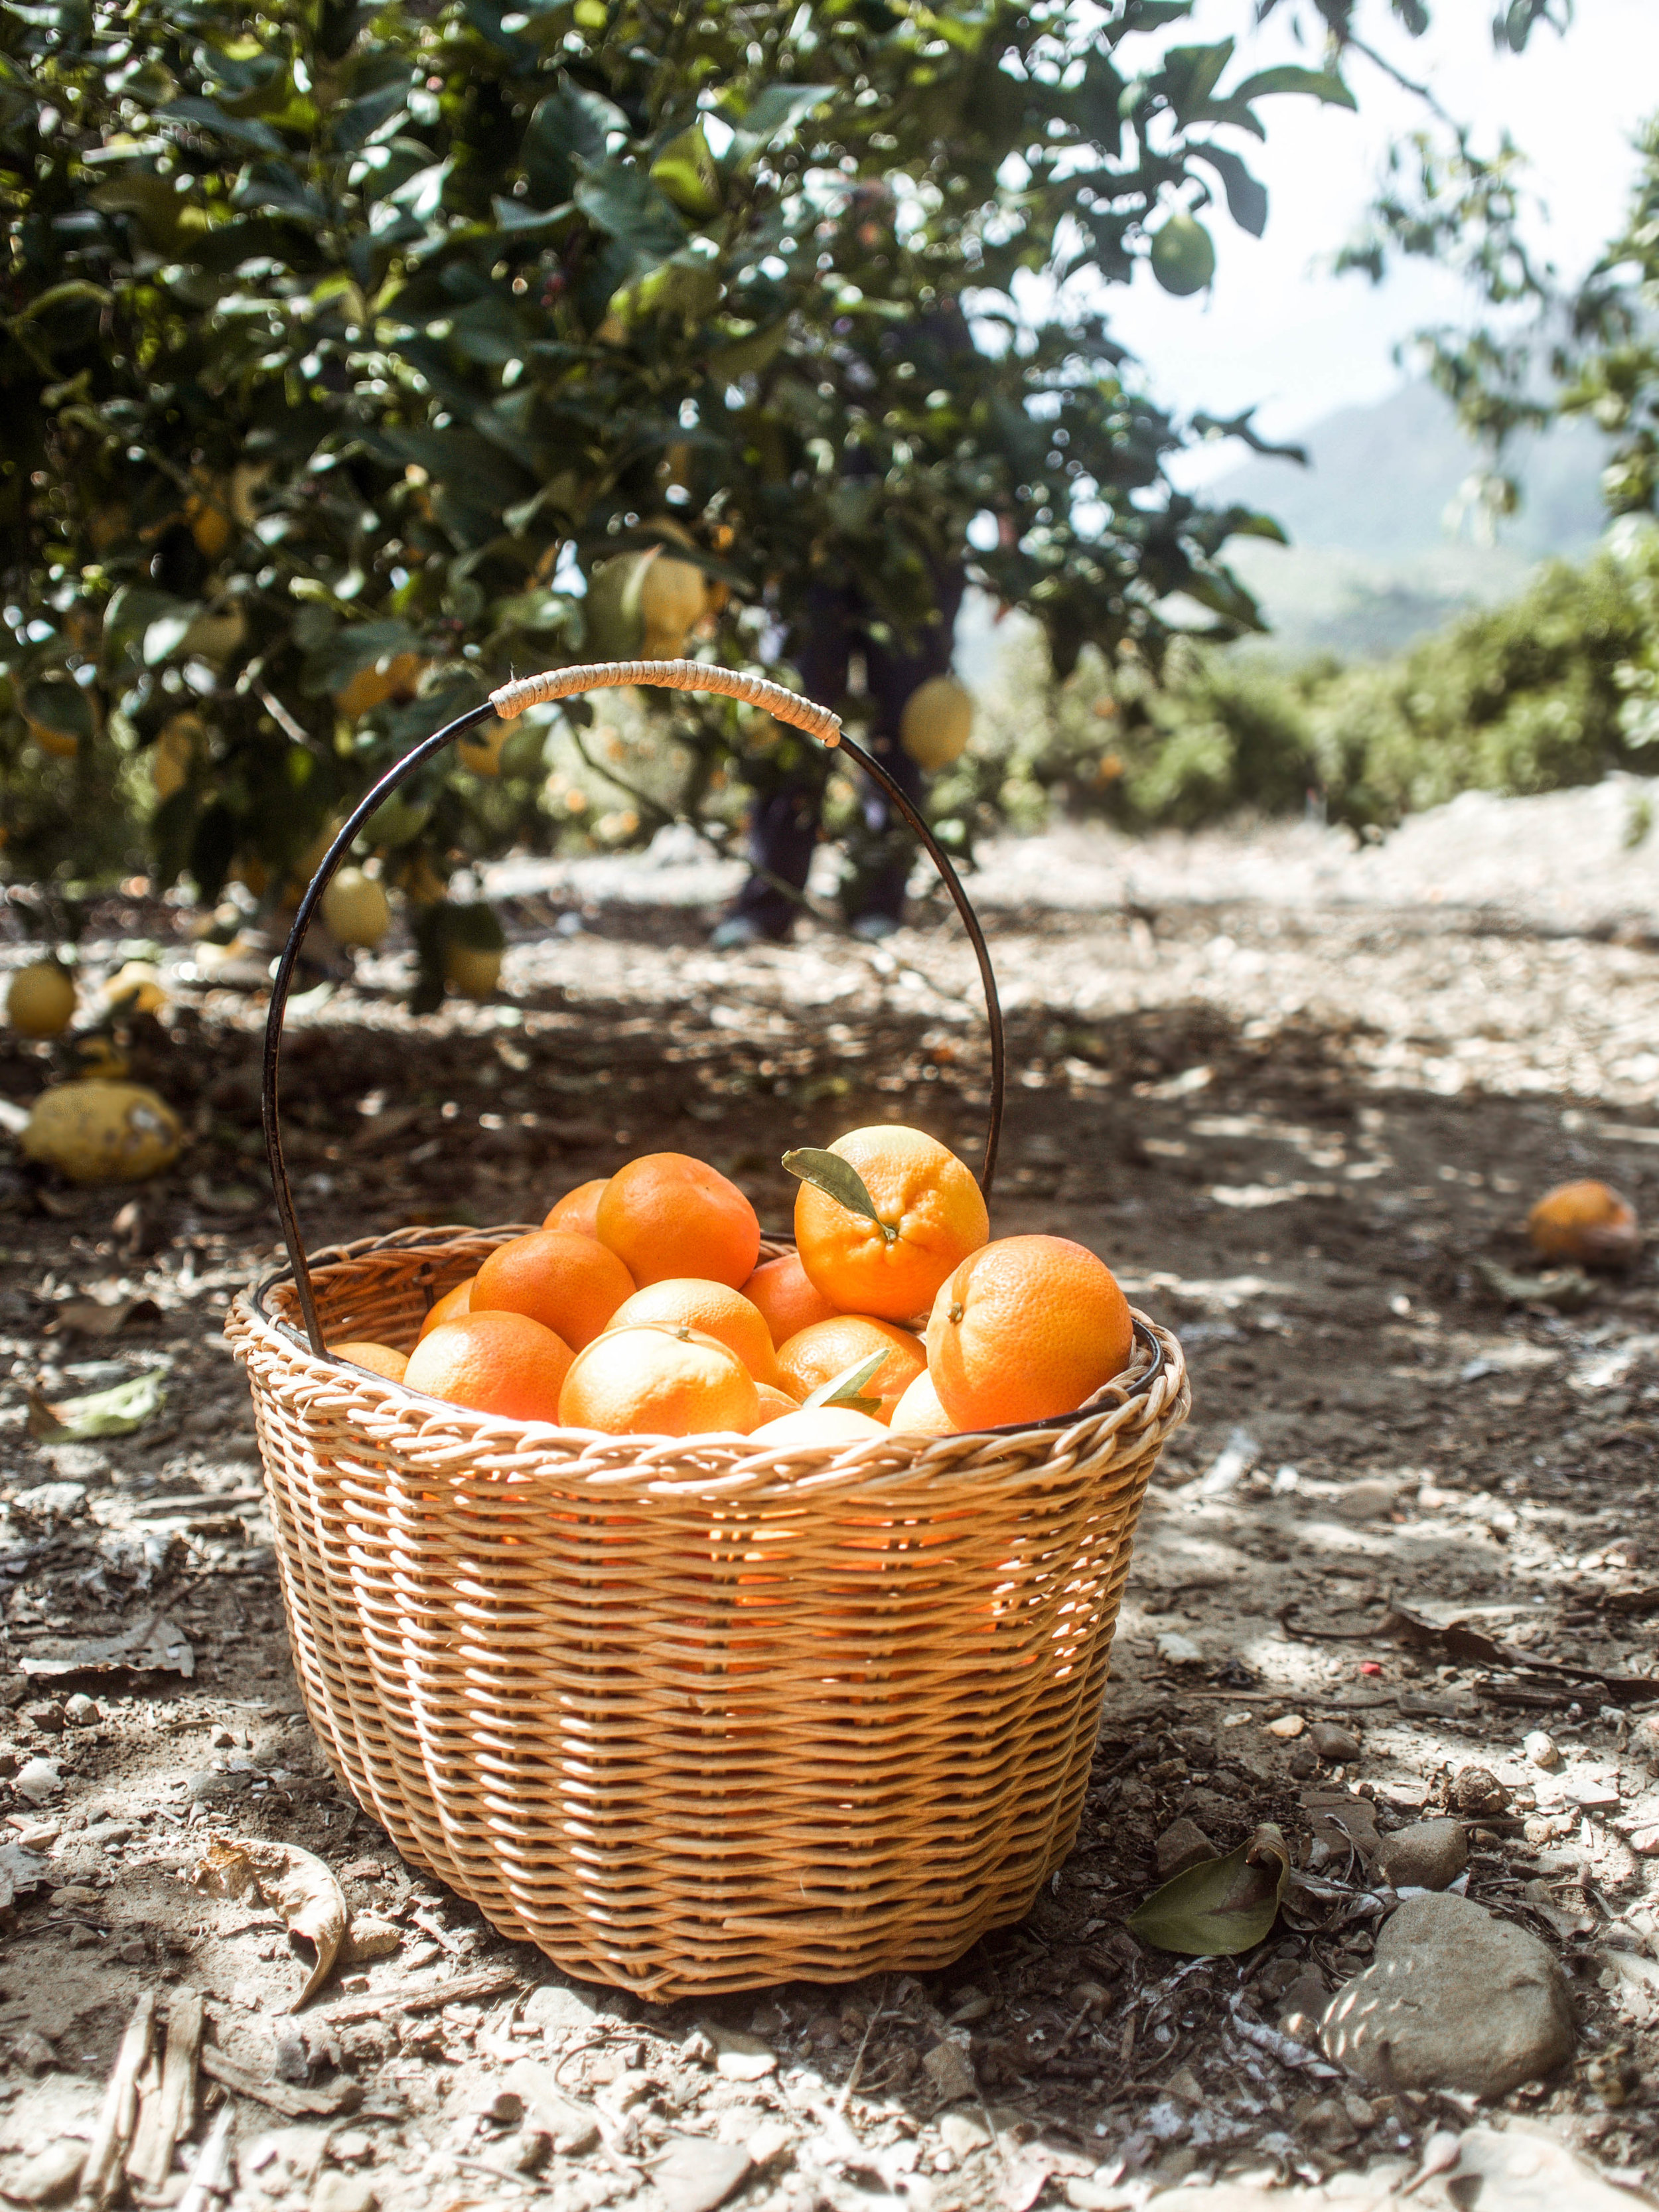 a basket of organic California oranges